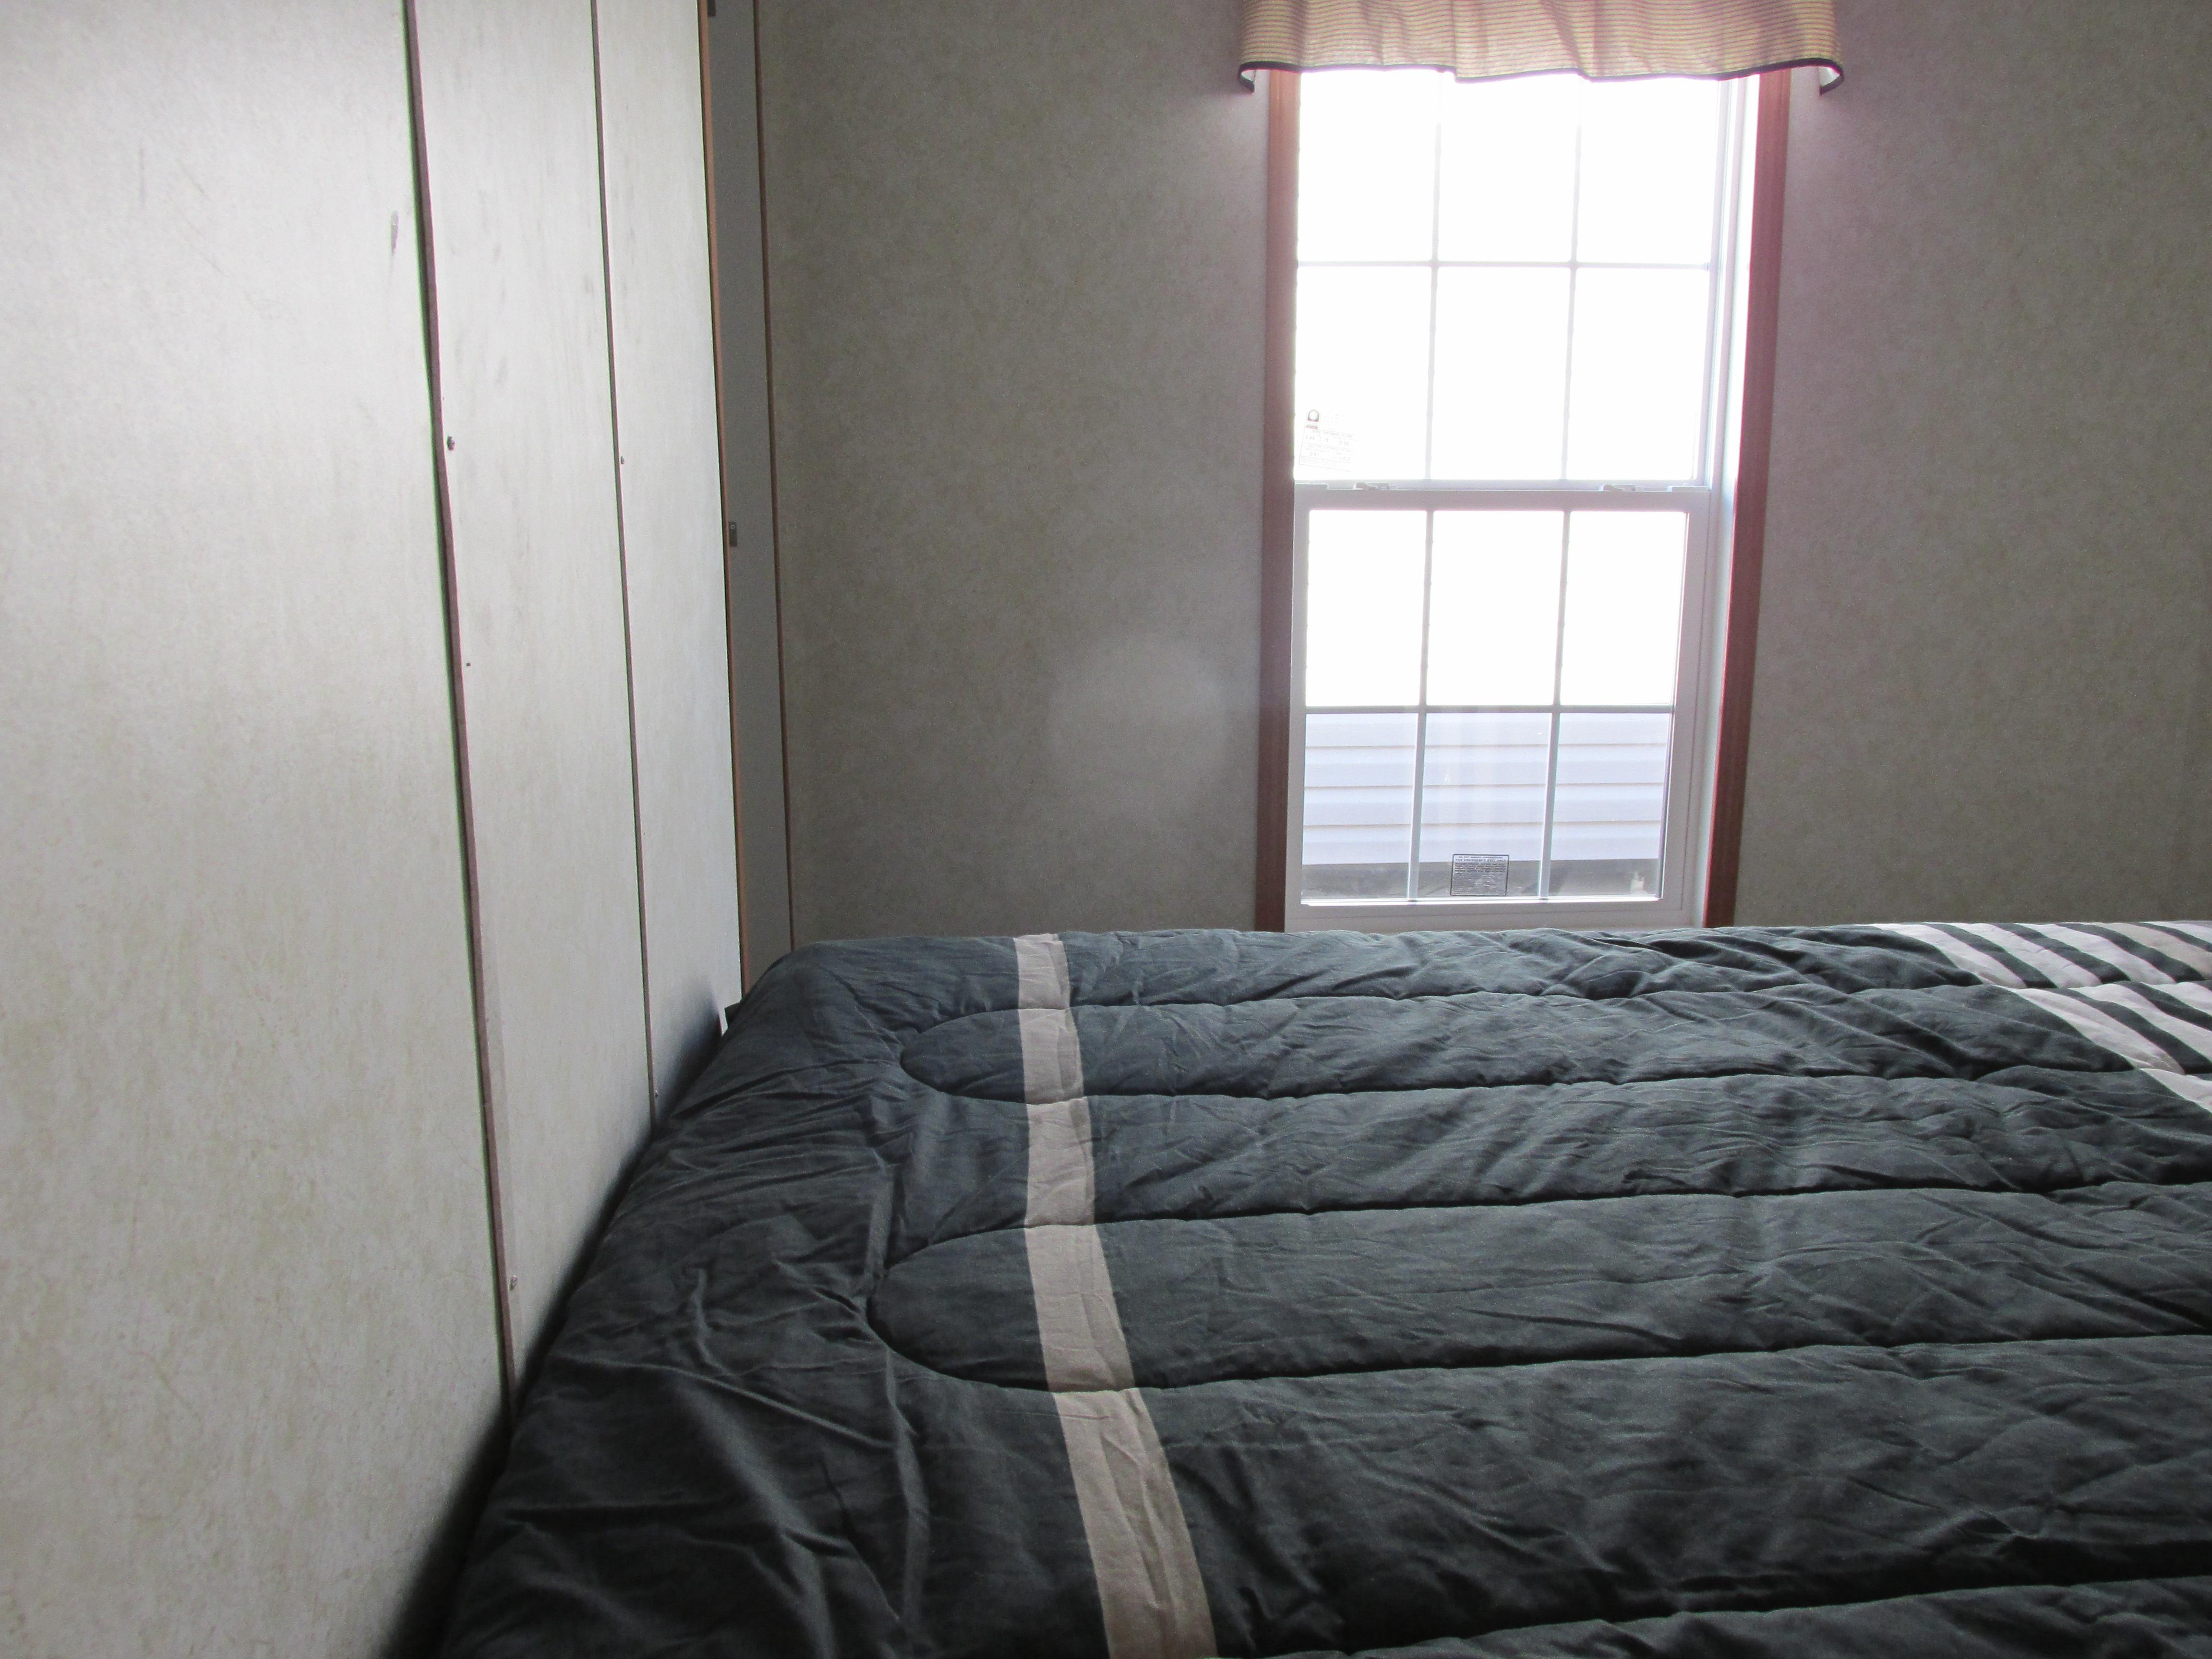 400 Bedroom#1-4.JPG